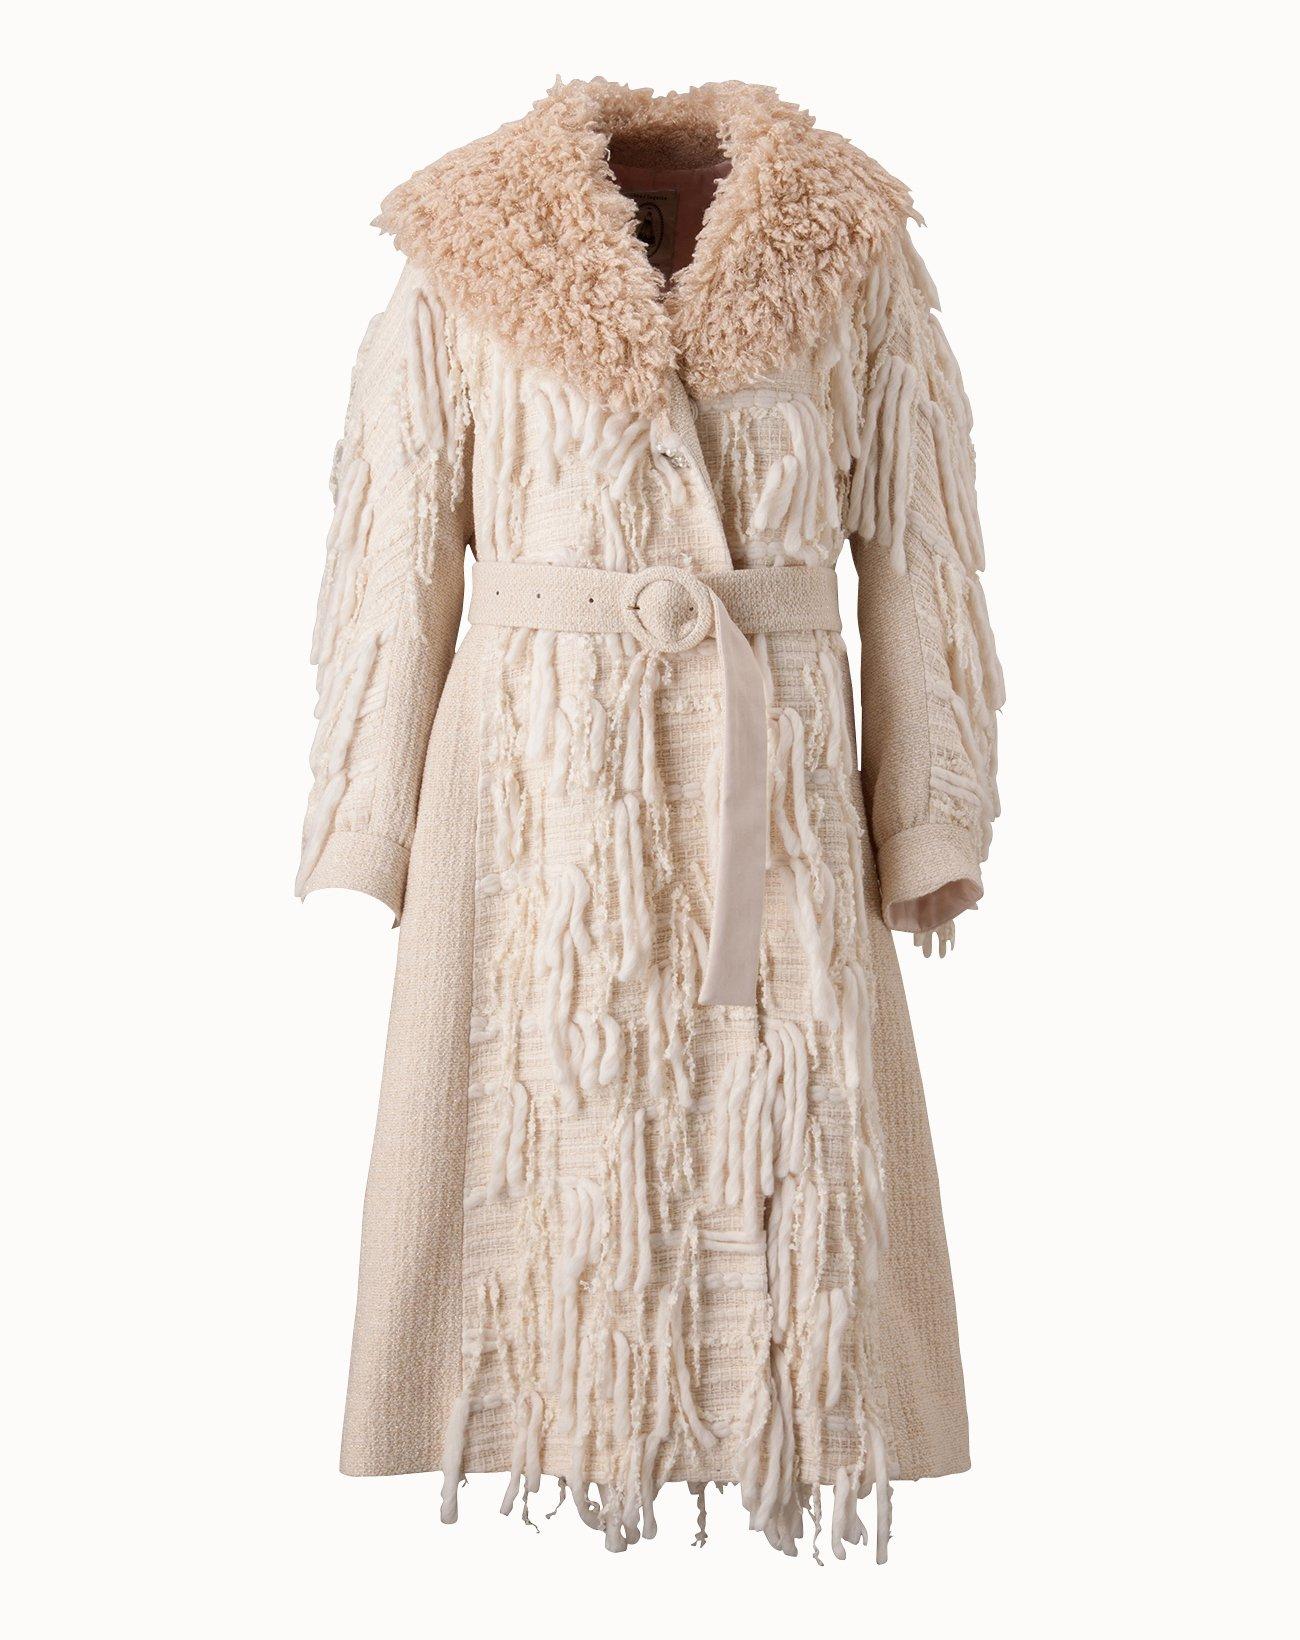 Roving Tweed Coat - Off White